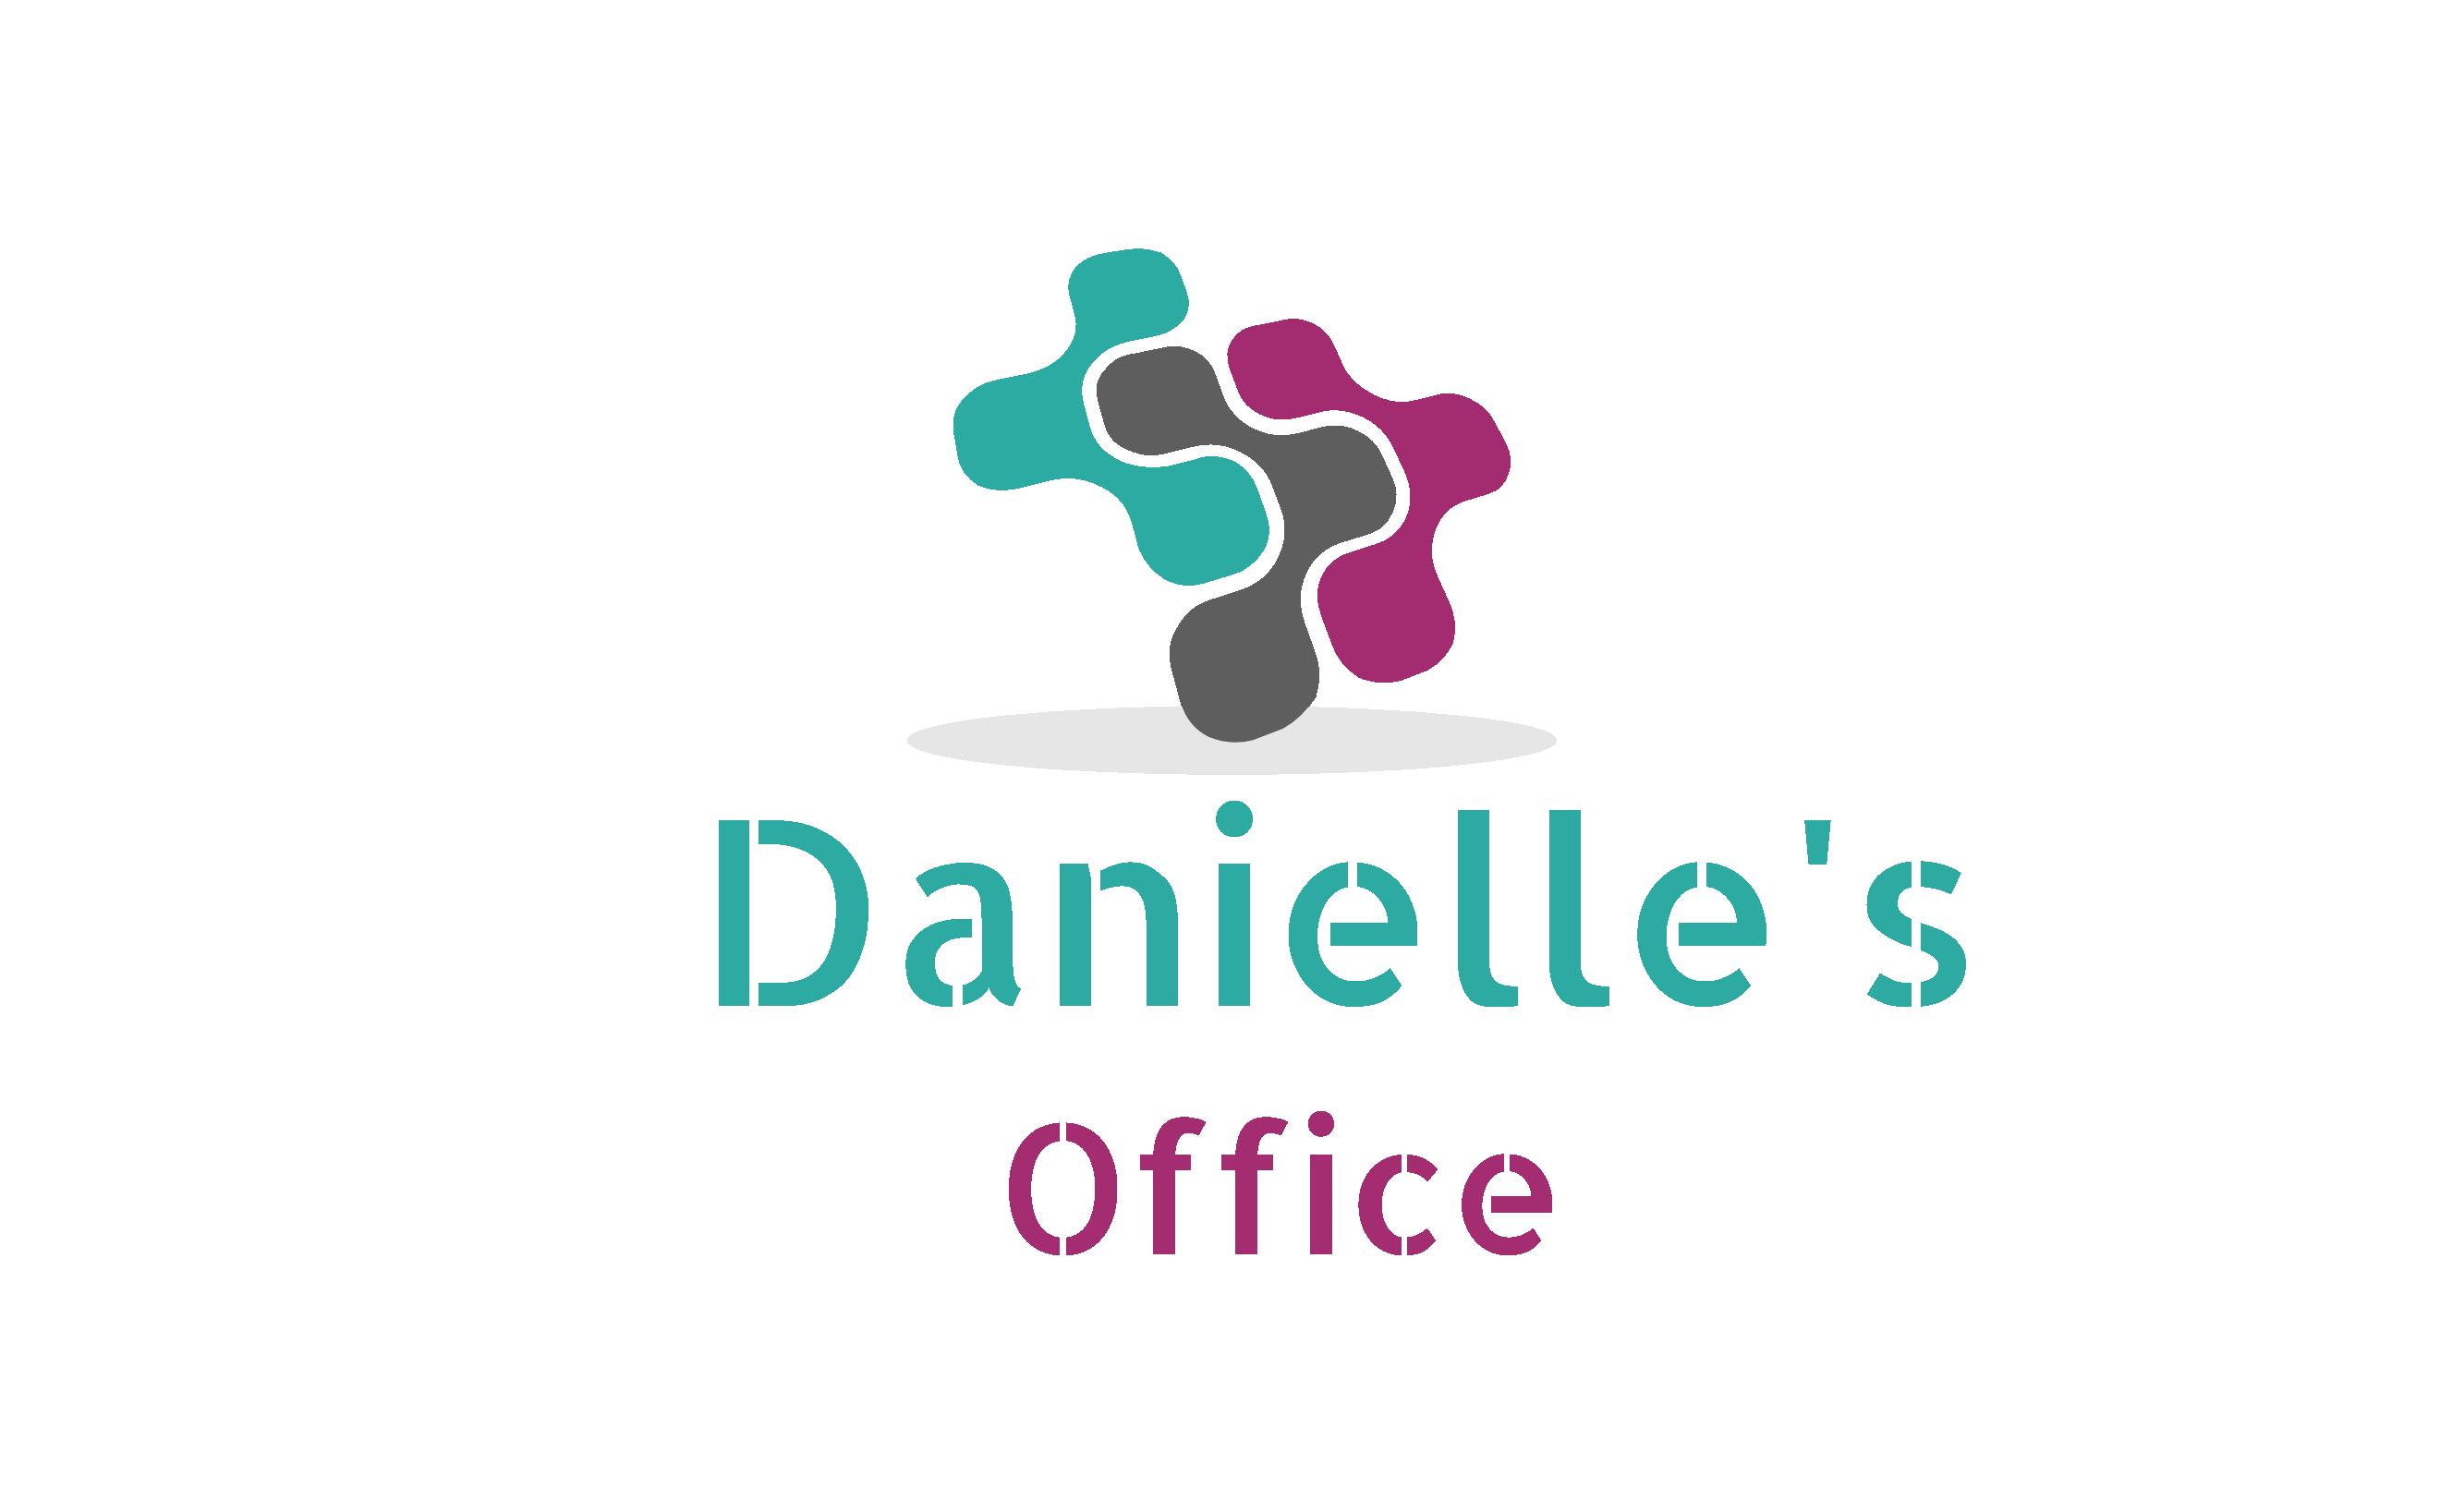 Danielle's Office